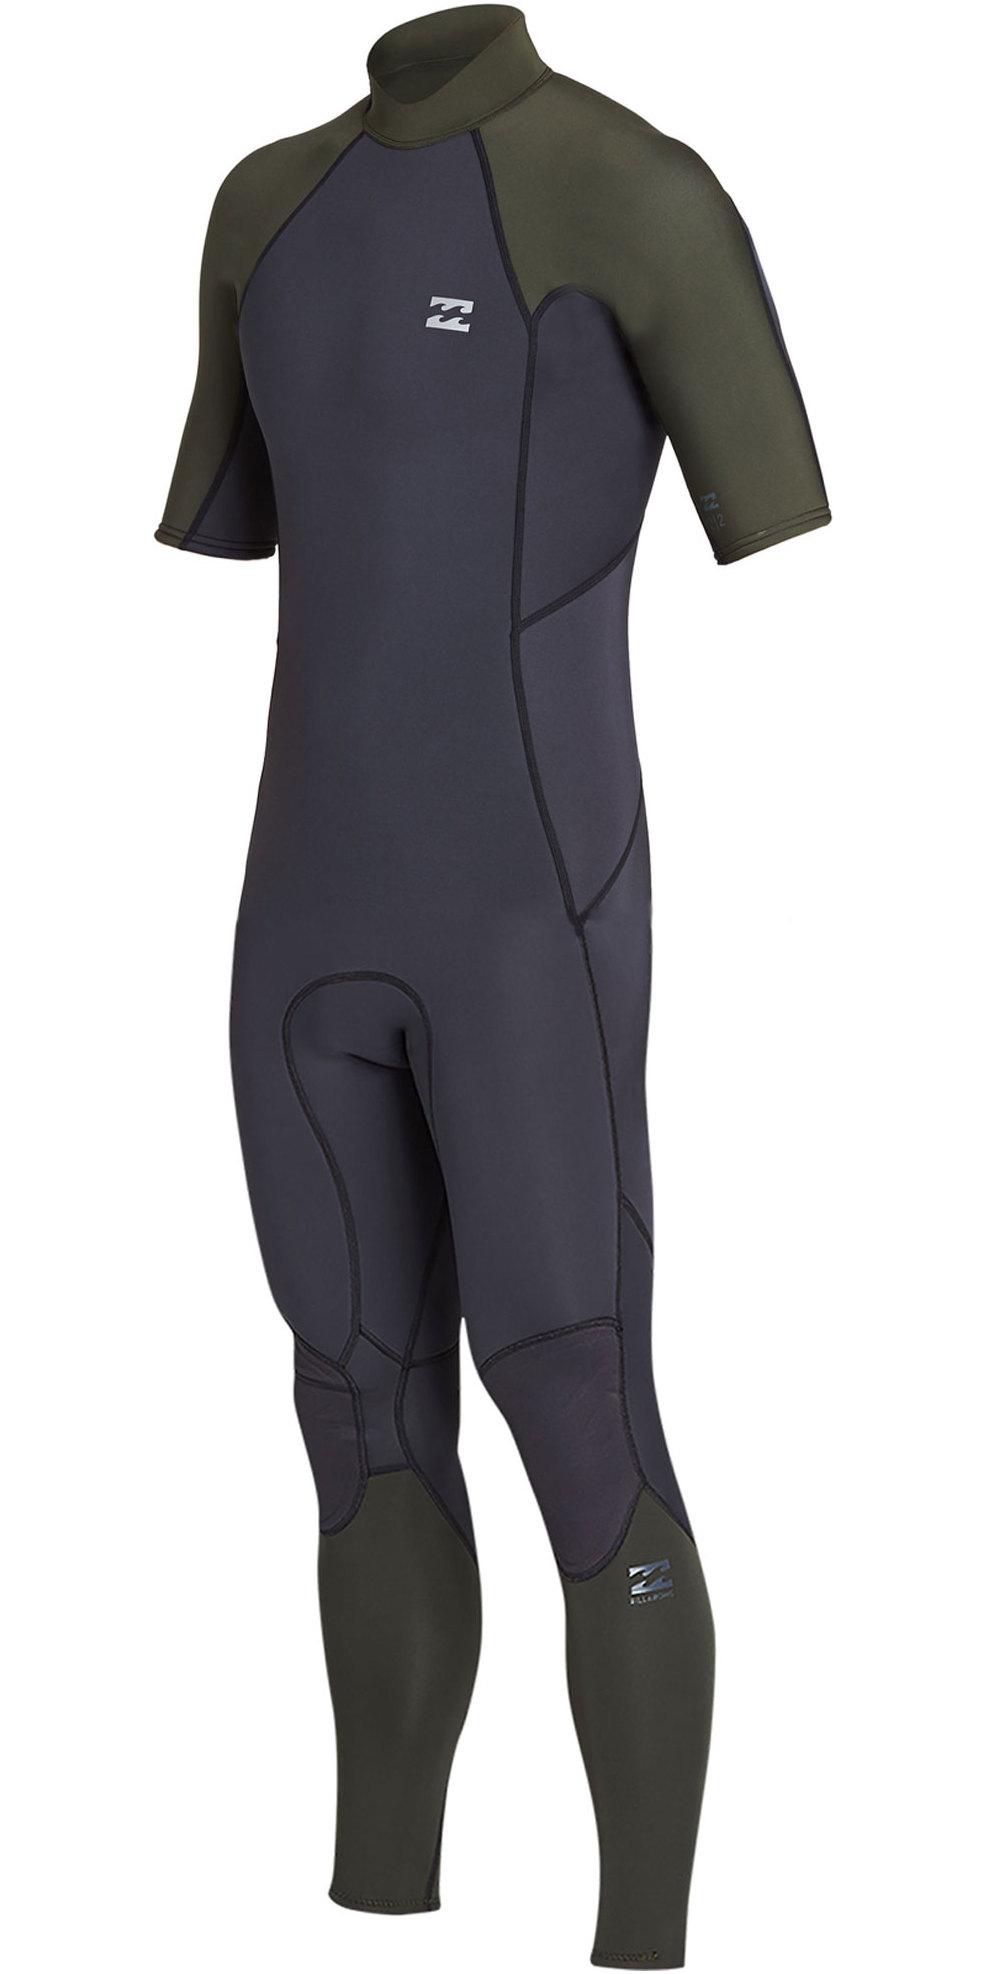 4df210c8a8e8 2019 Billabong Mens 2mm Furnace Absolute Back Zip Short Sleeve Wetsuit Black  Olive N42m29 - | Wetsuit Outlet